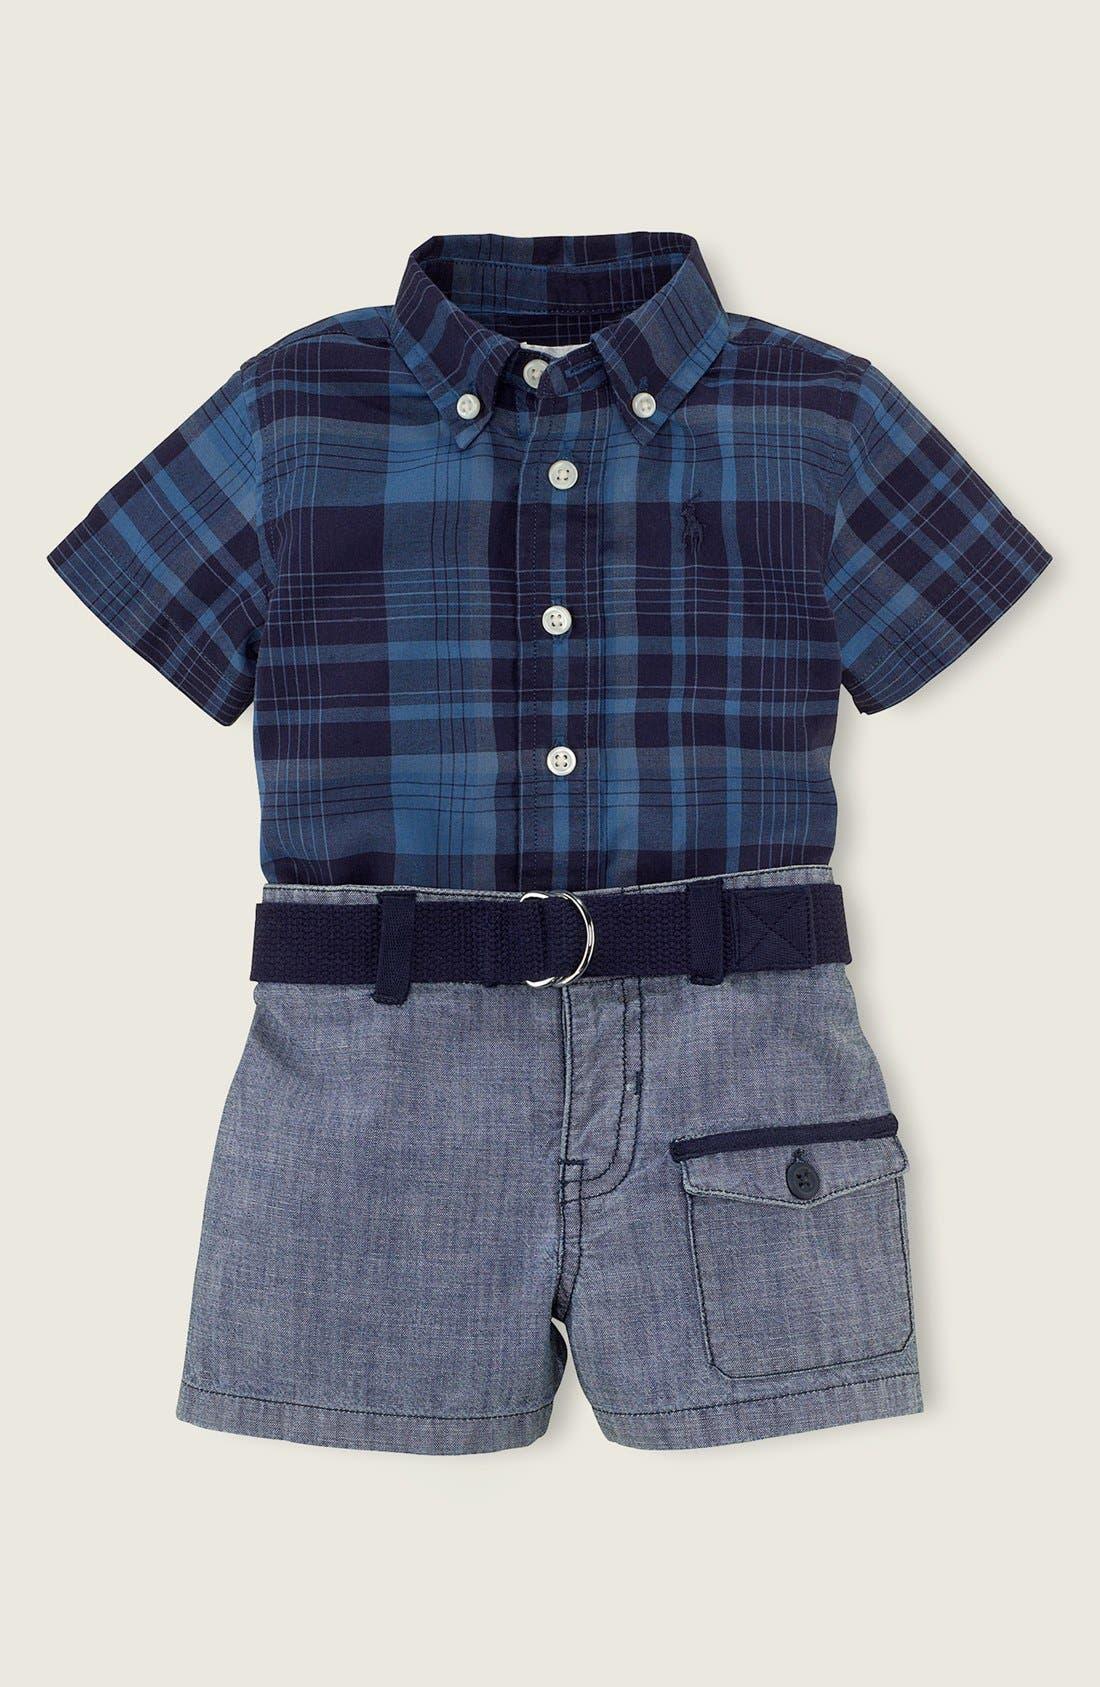 Alternate Image 2  - Ralph Lauren Plaid Shirt & Shorts (Baby Boys)